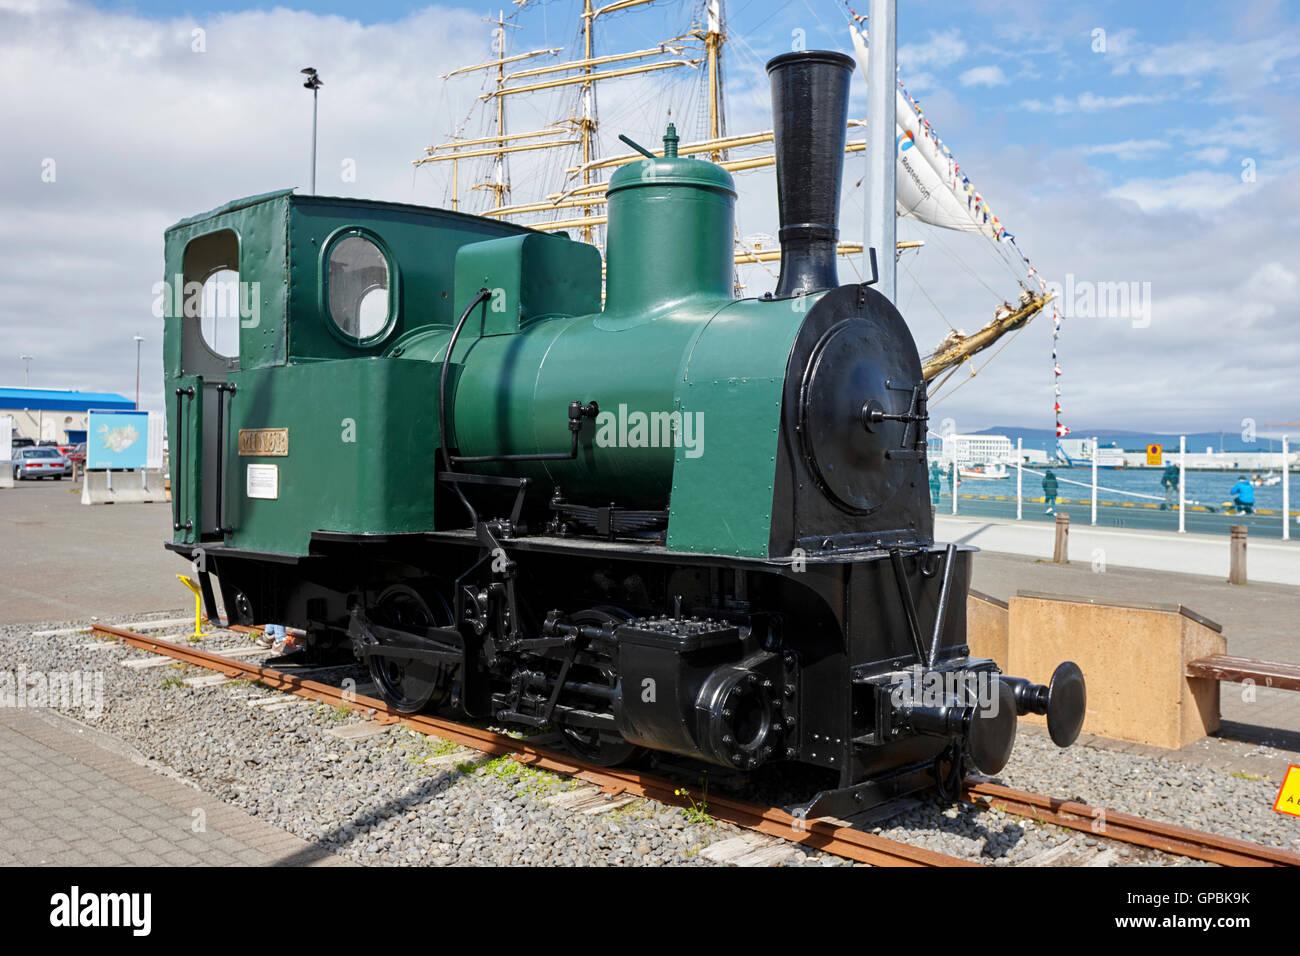 early icelandic steam locomotive minor exhibited in reykjavik harbour Iceland - Stock Image